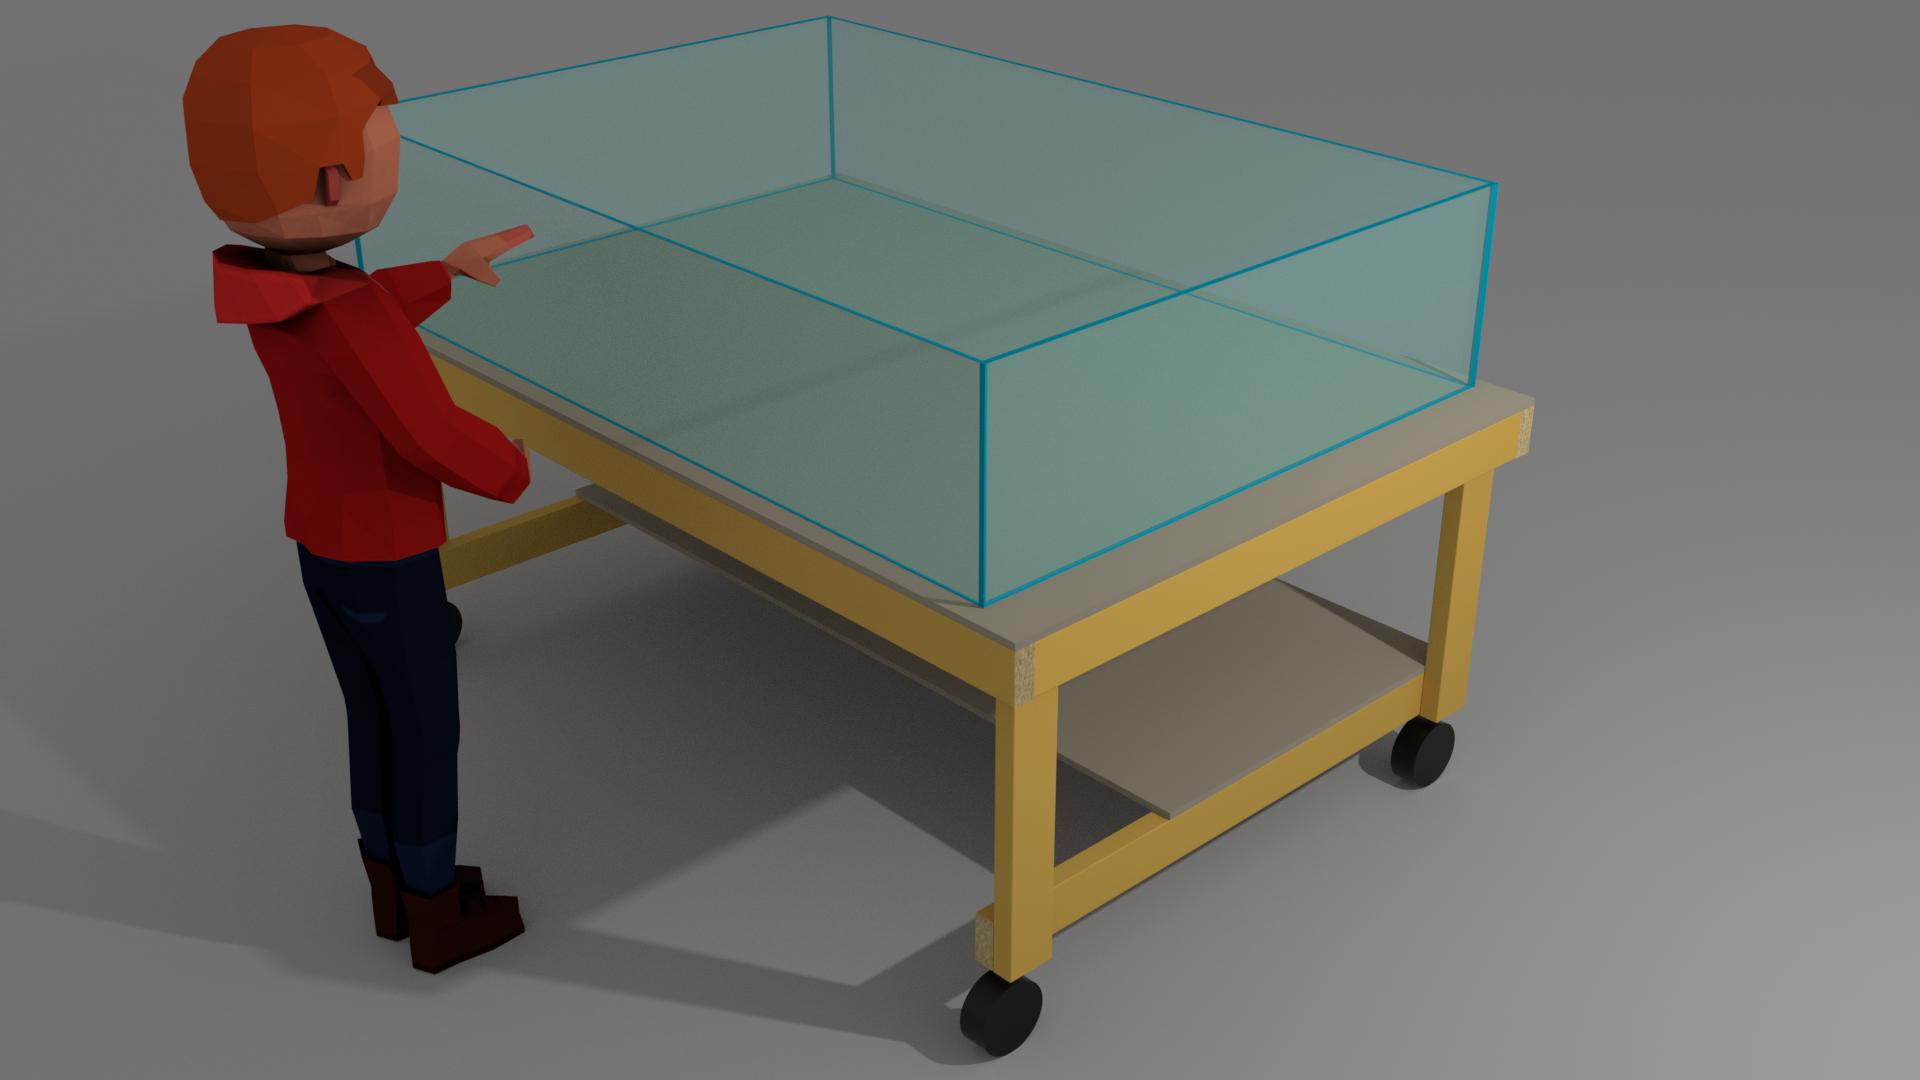 Lasersaur table